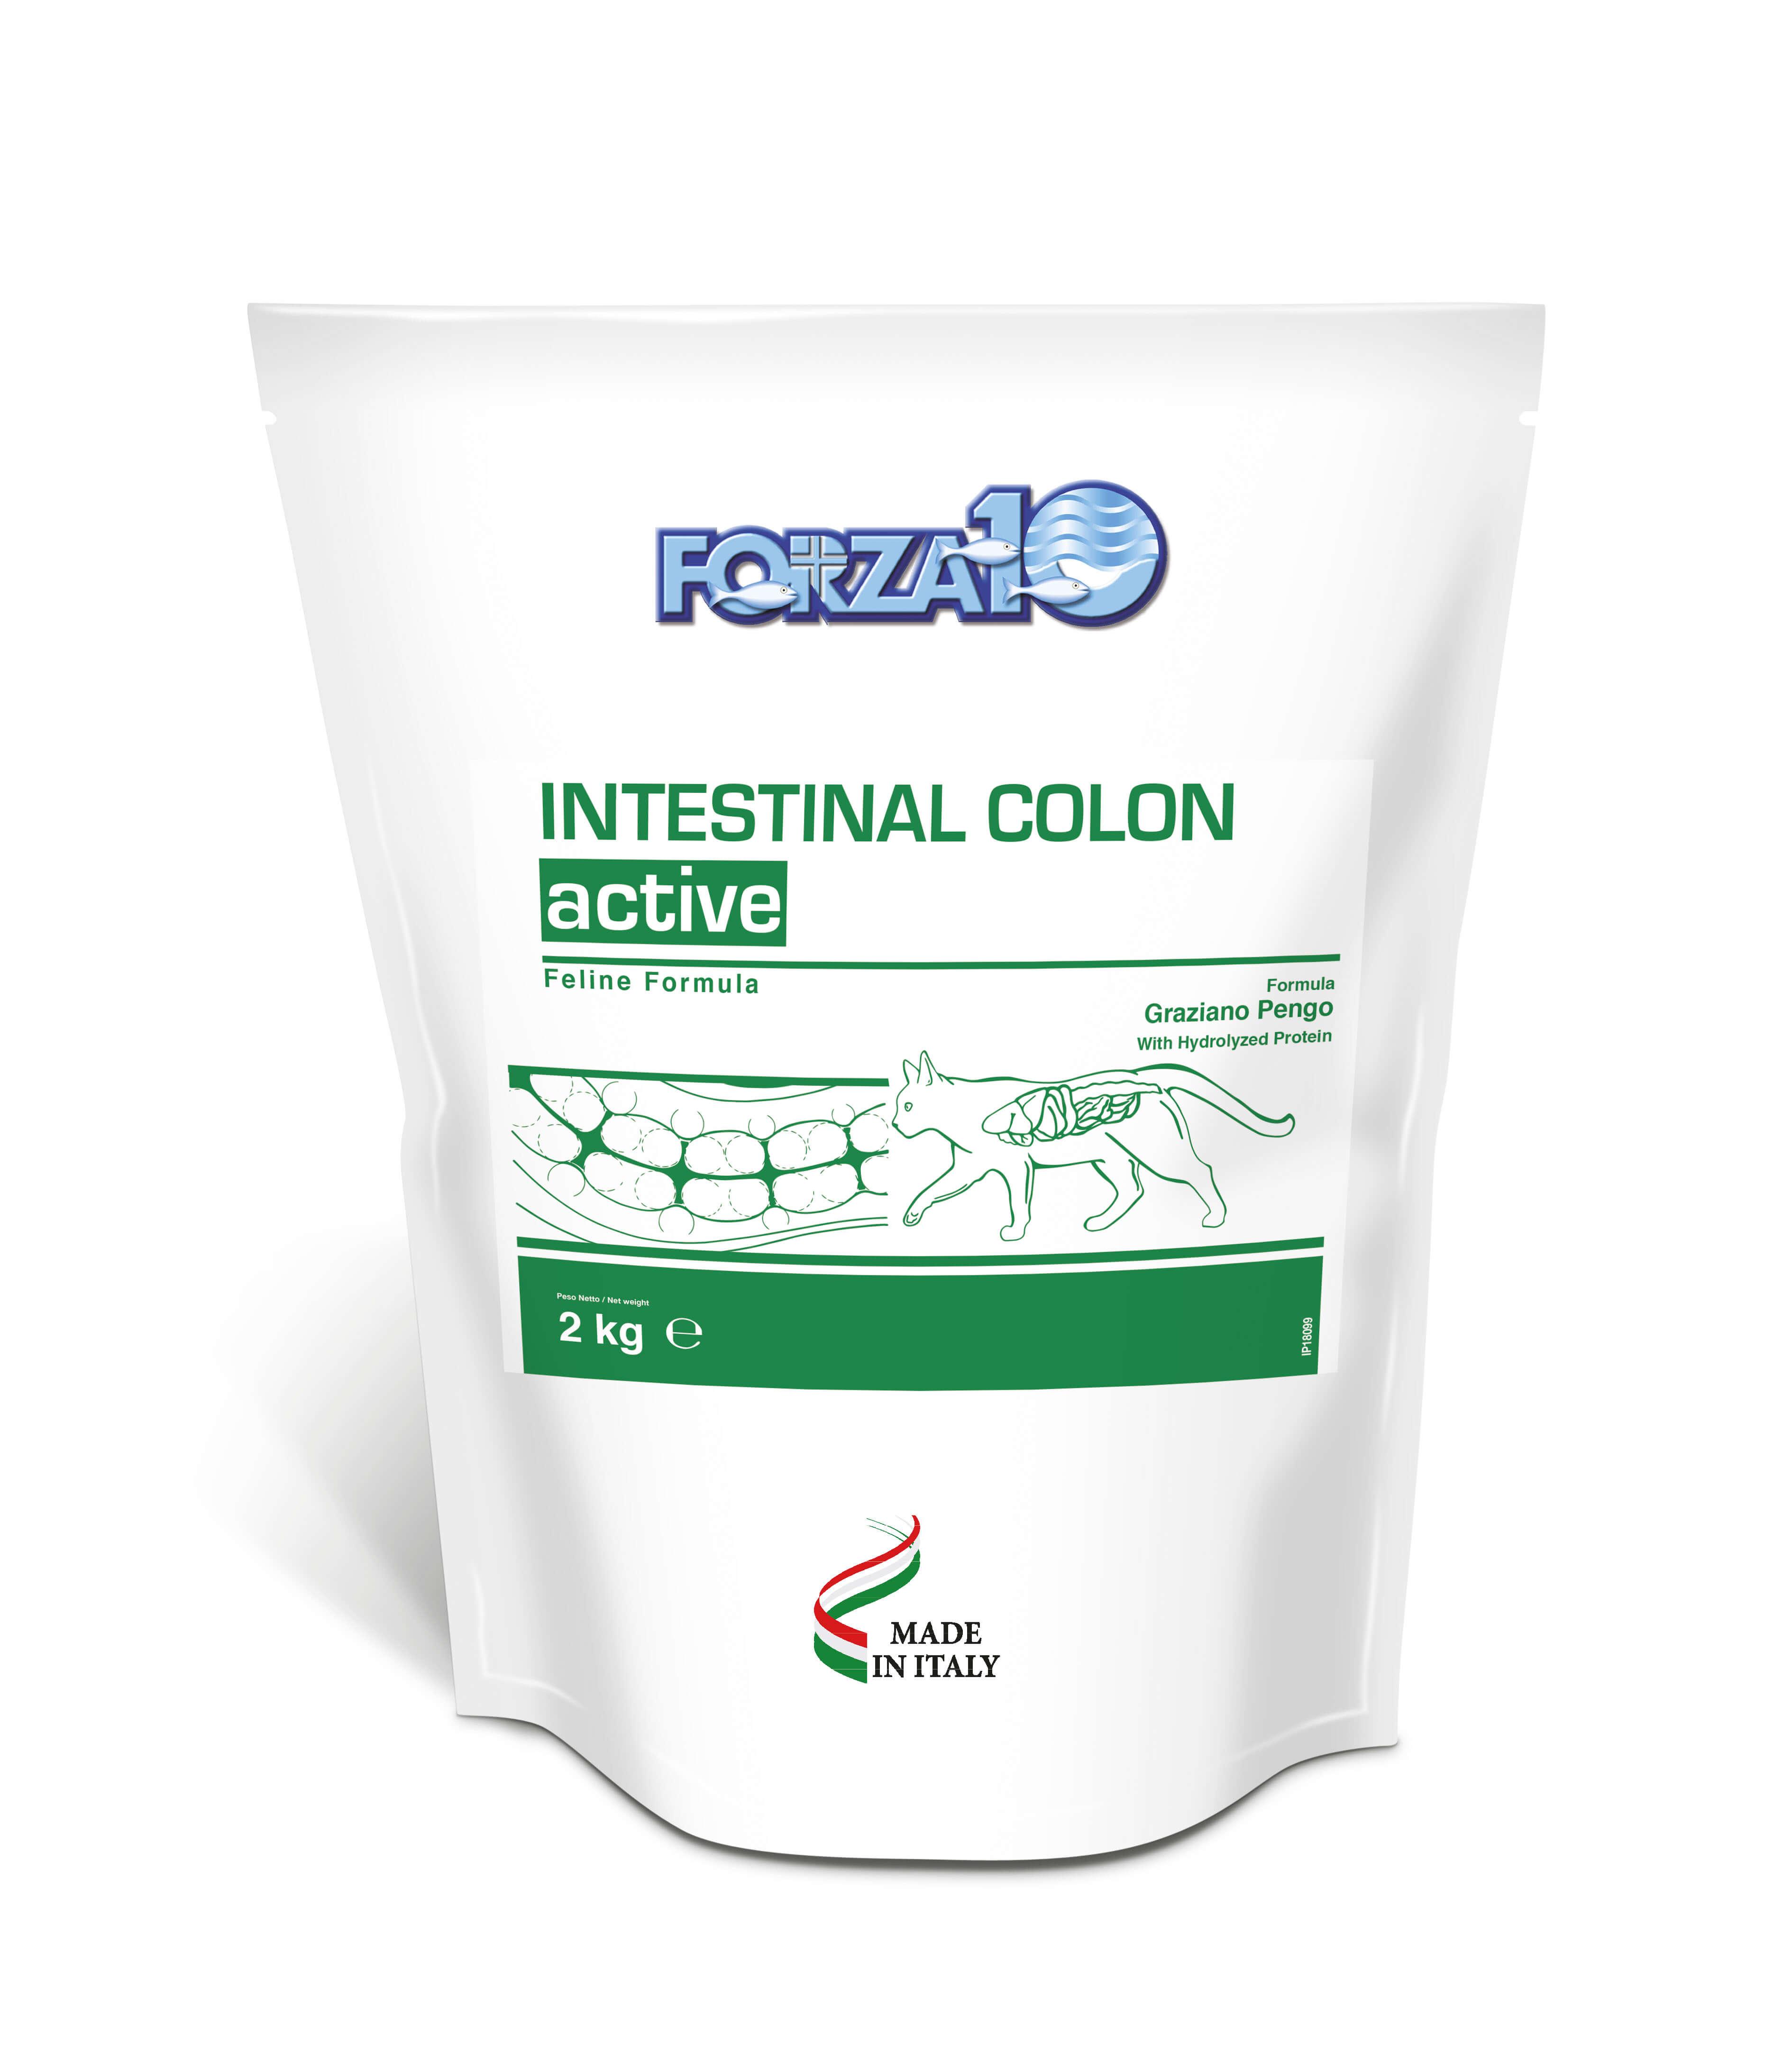 Лечящий корм для кошек FORZA 10 Intestinal COLON фоца 10 форза 10